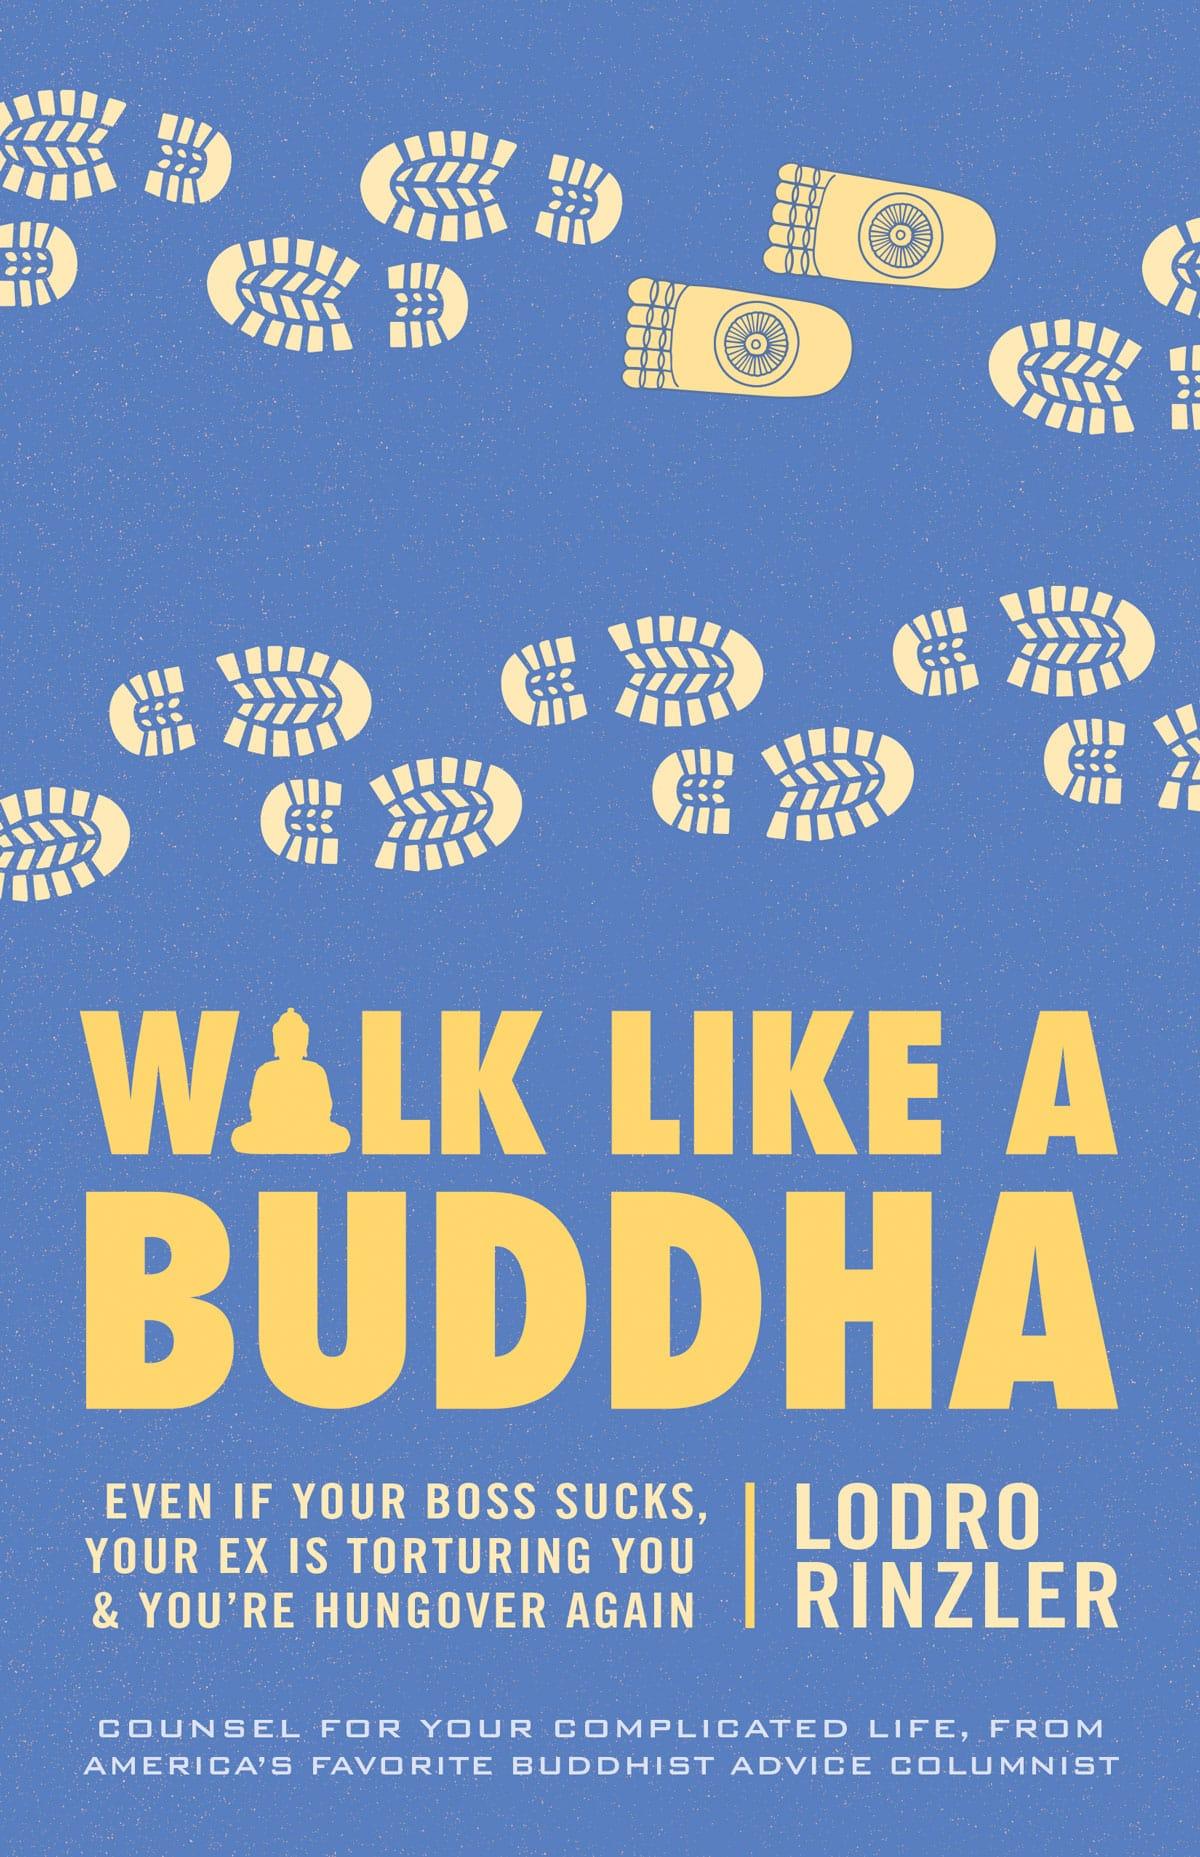 Walk Like a Buddha Lodro Rinzler Office